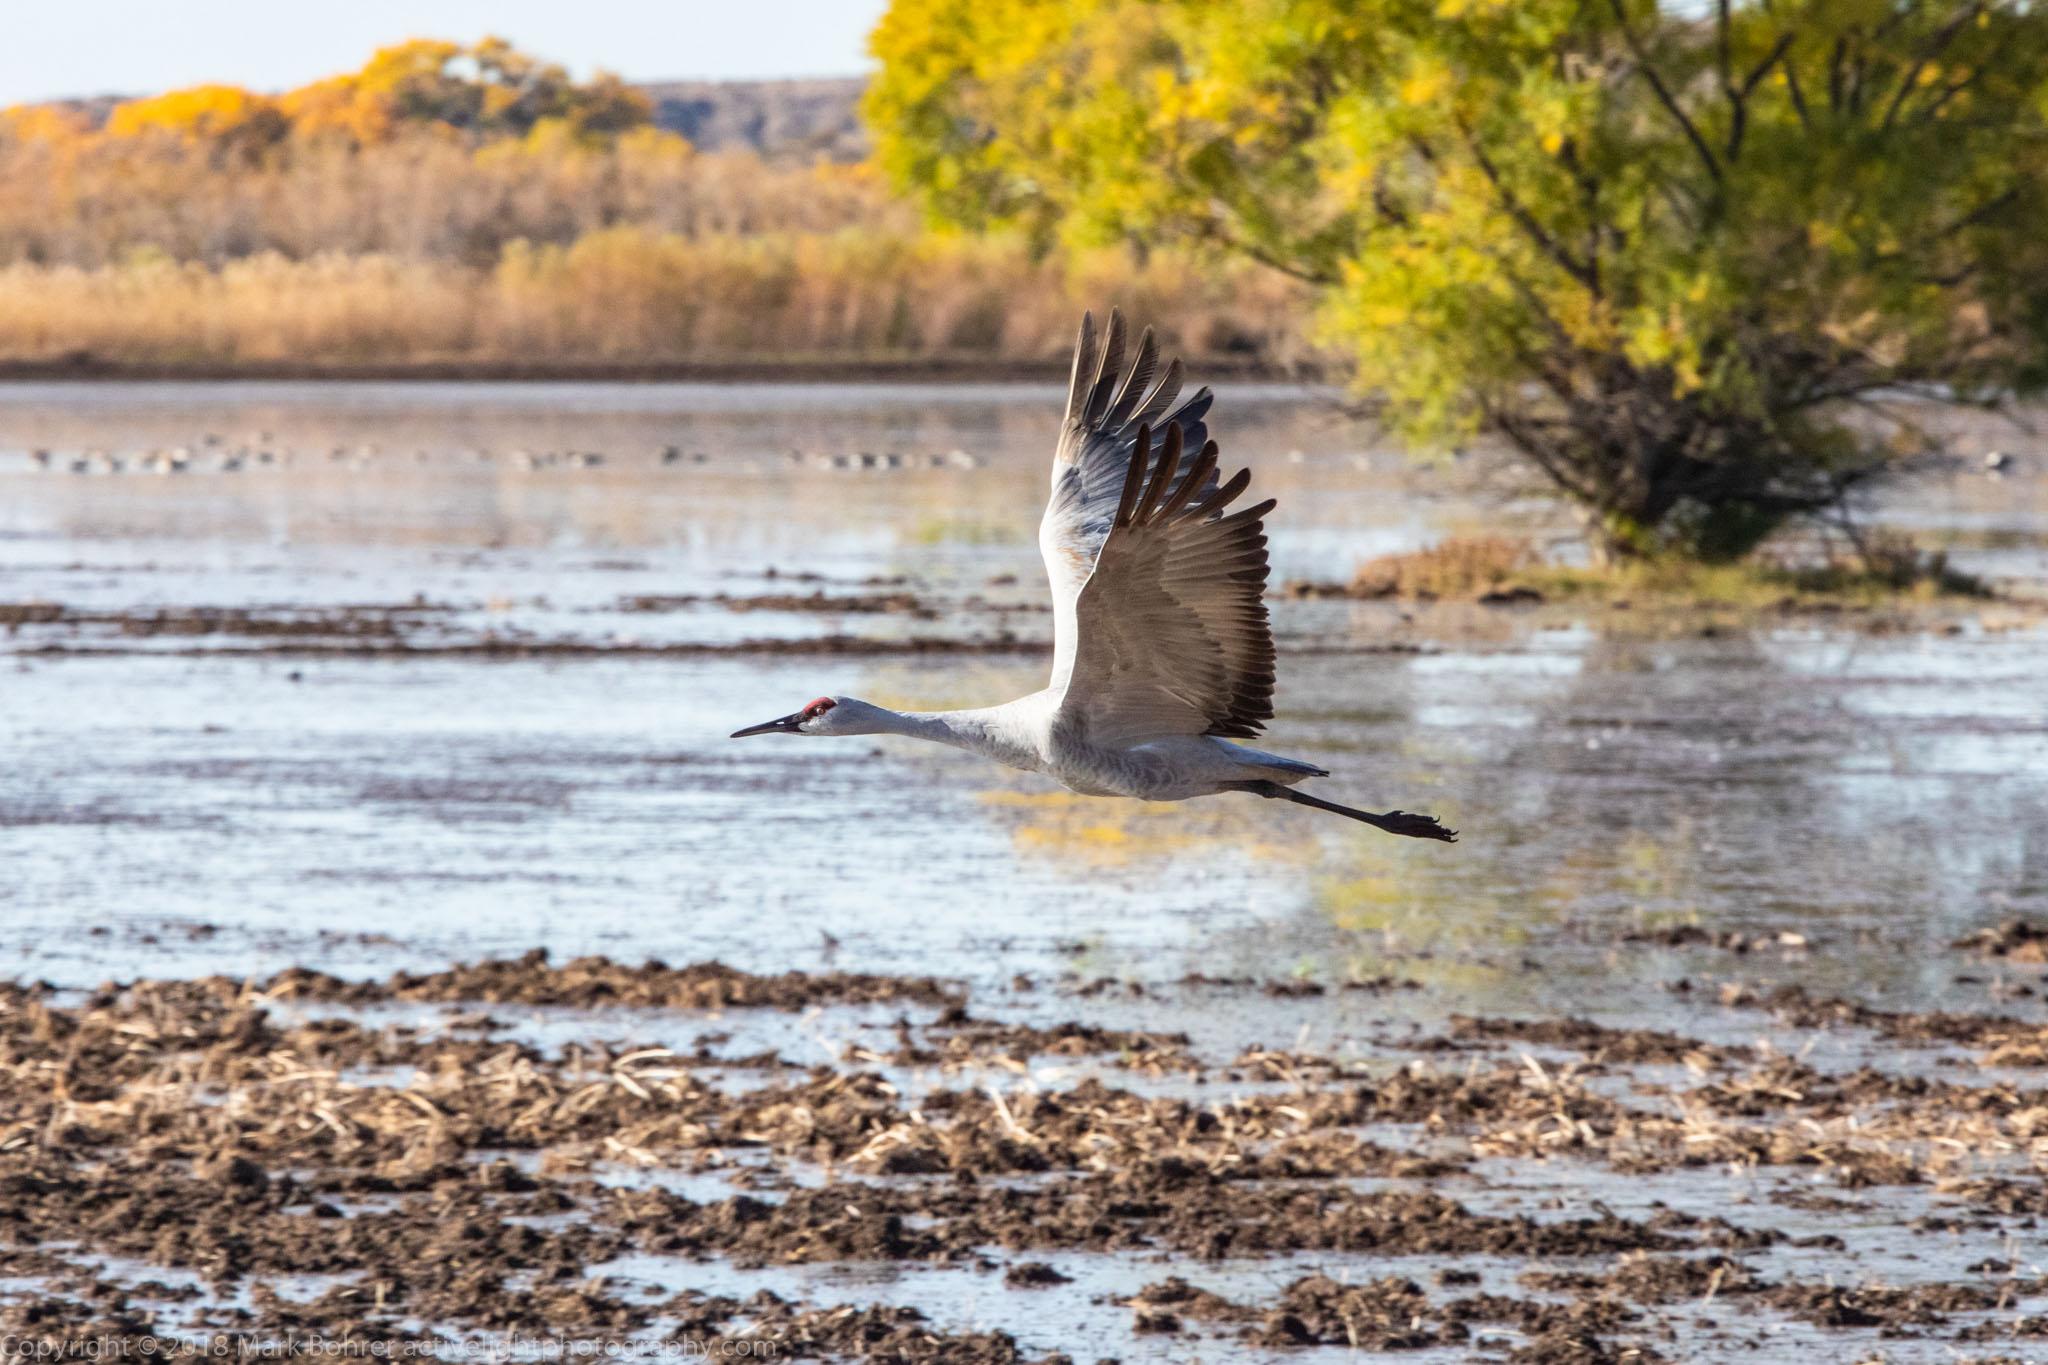 Crane flight over the marsh